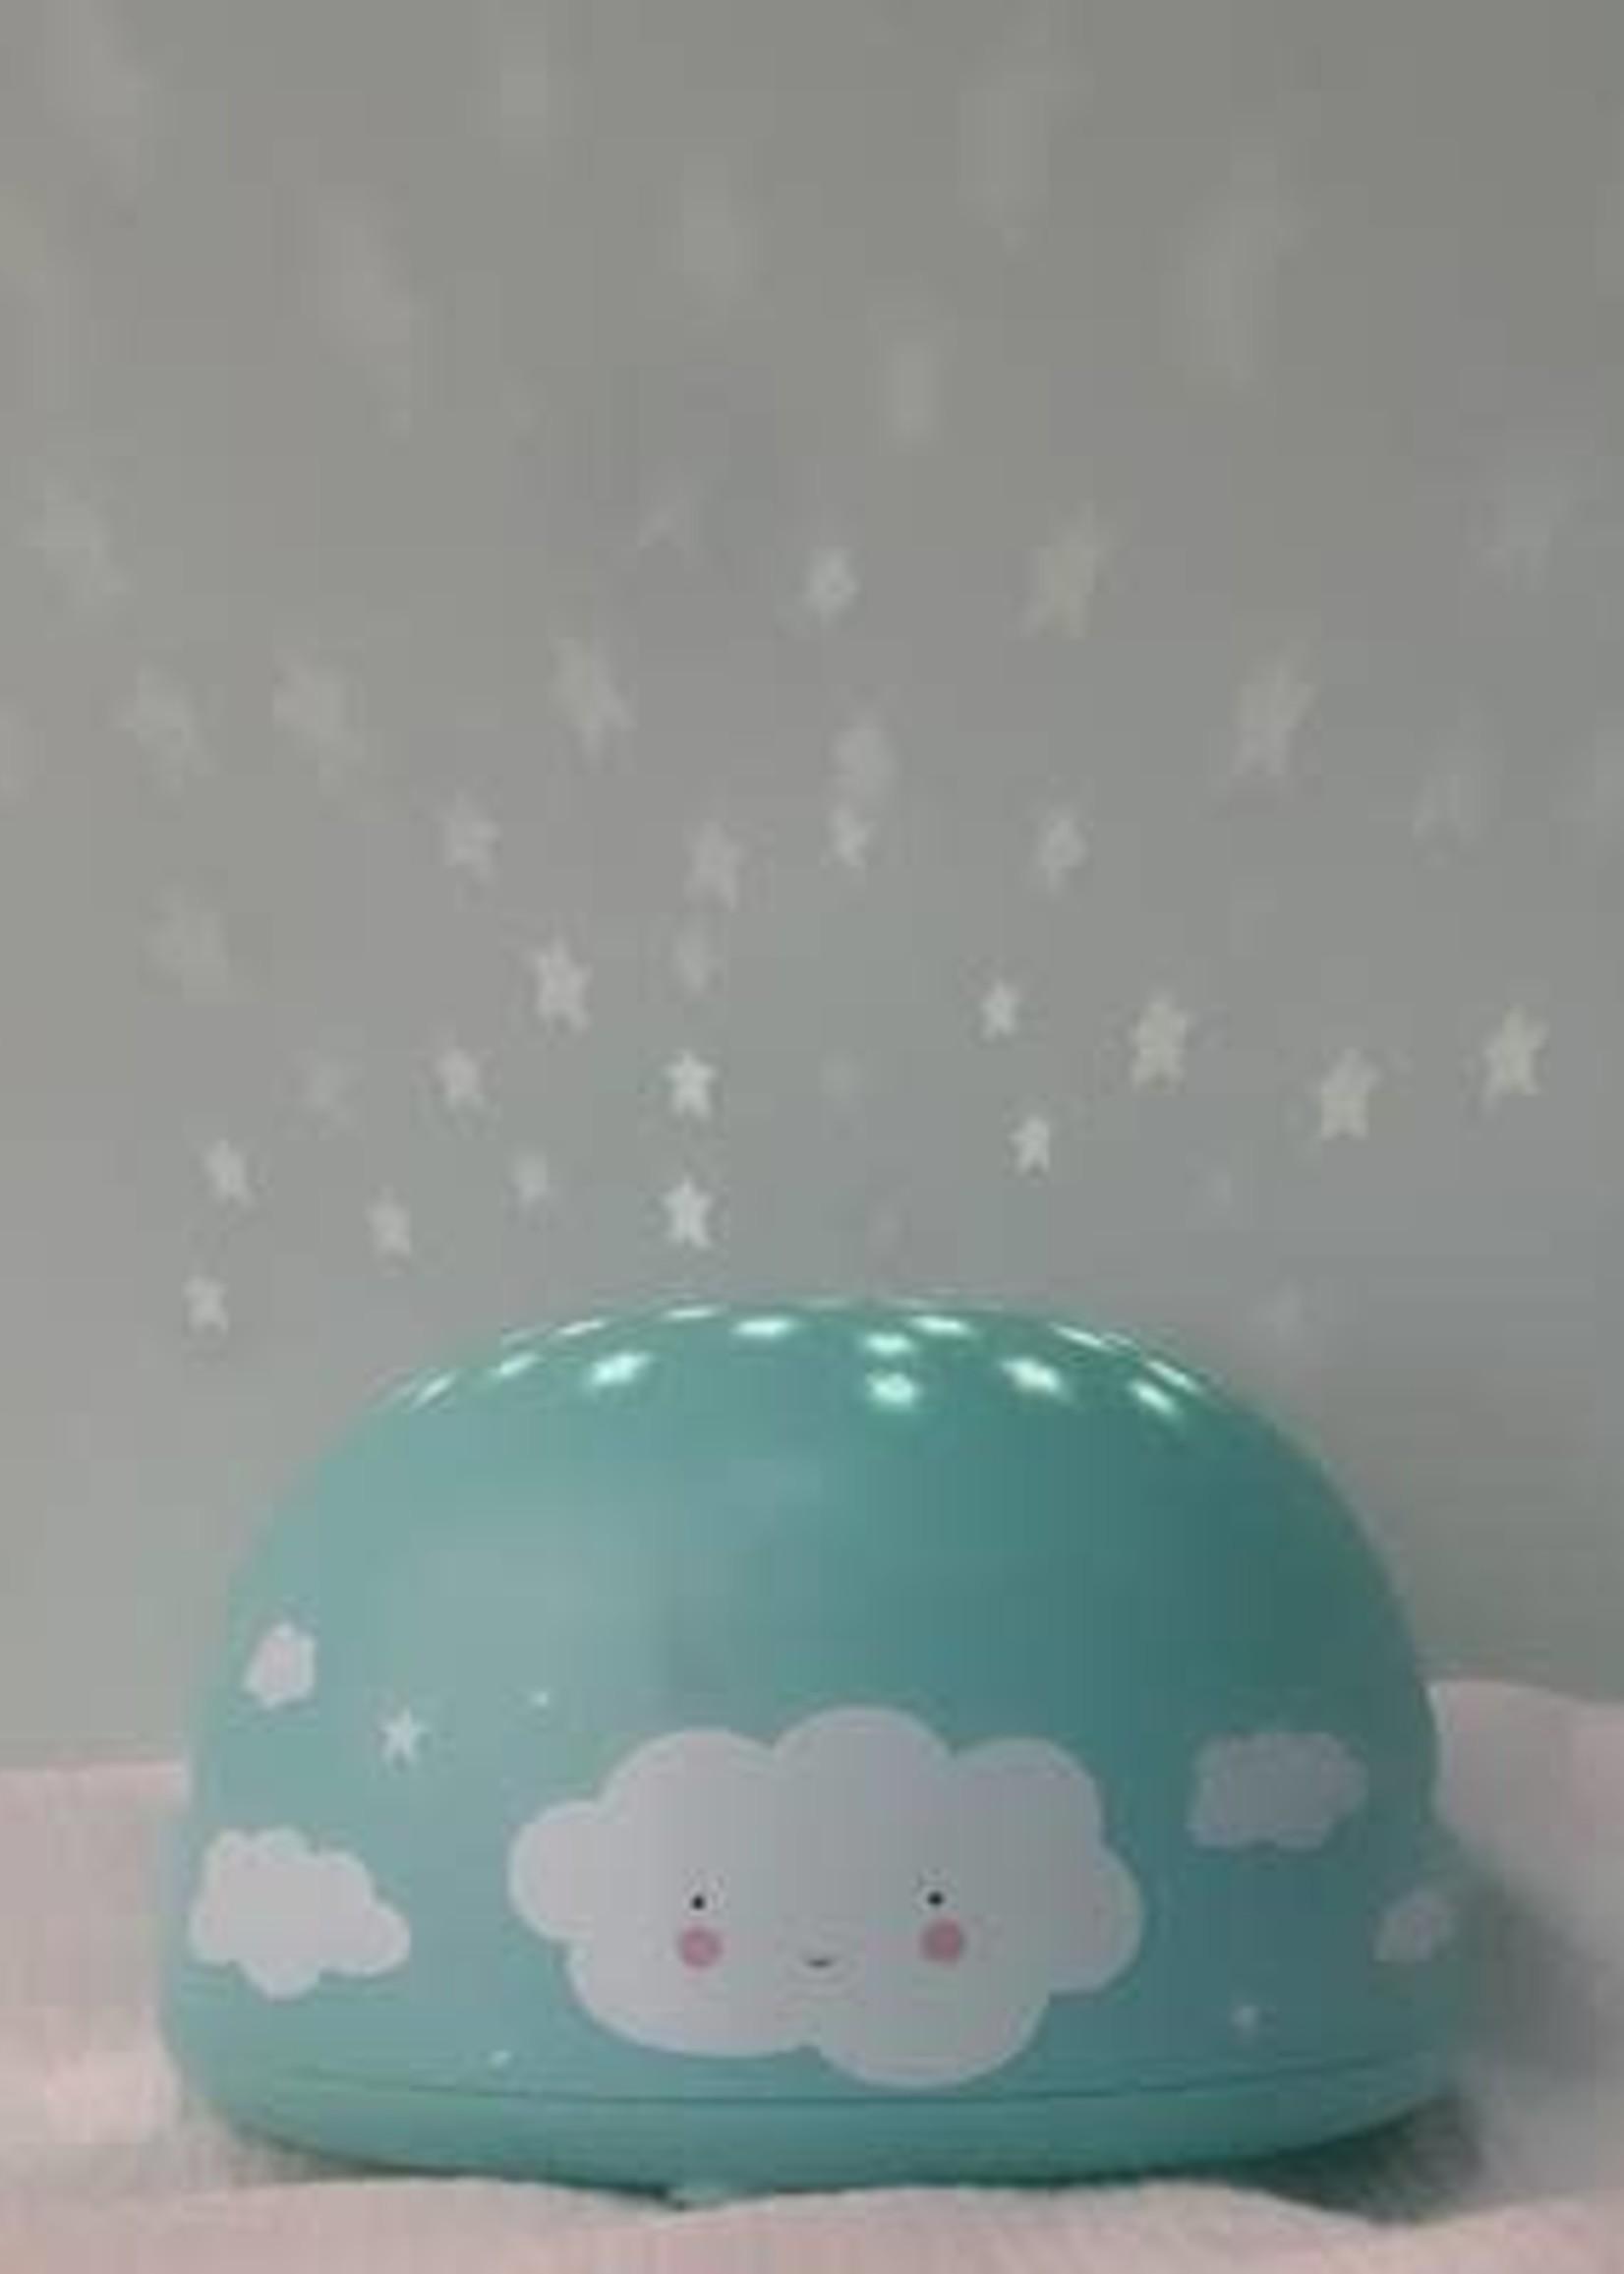 A Little Lovely Co. Little Lovely Company Projector Light (Cloud)